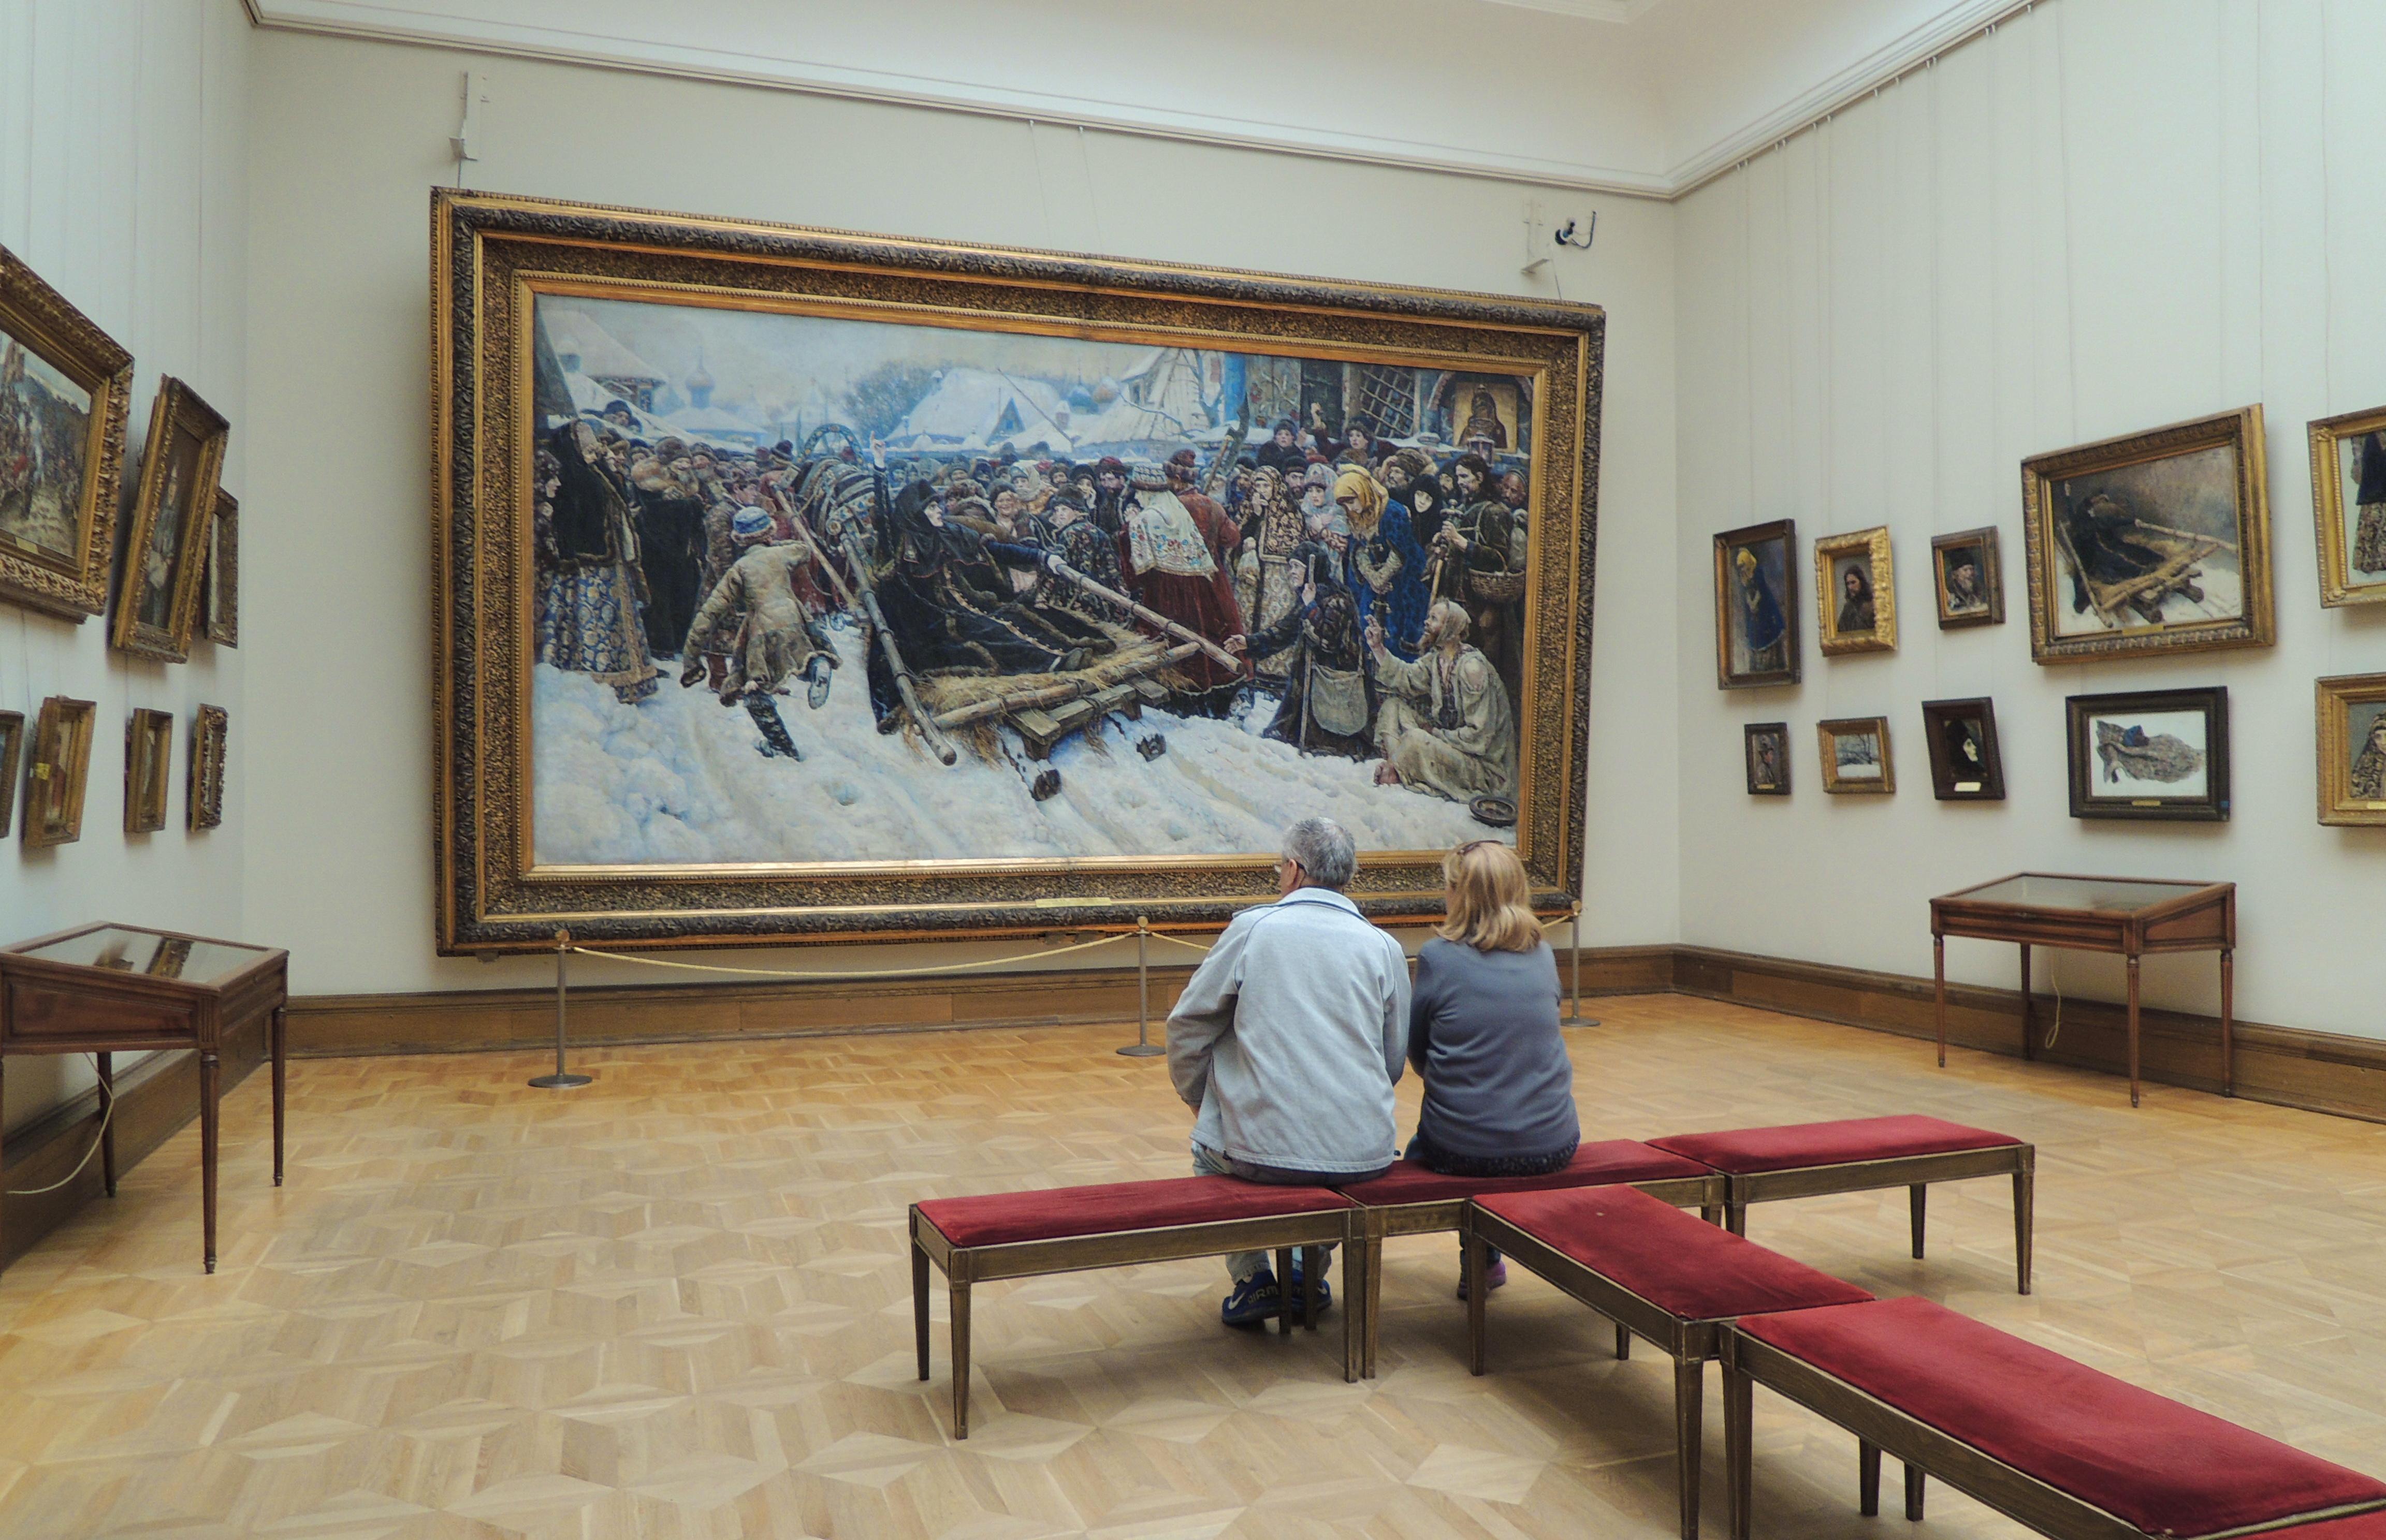 https://upload.wikimedia.org/wikipedia/commons/1/18/Hall_N28_Tretyakov_gallery_-_Surikov_01_by_shakko.JPG